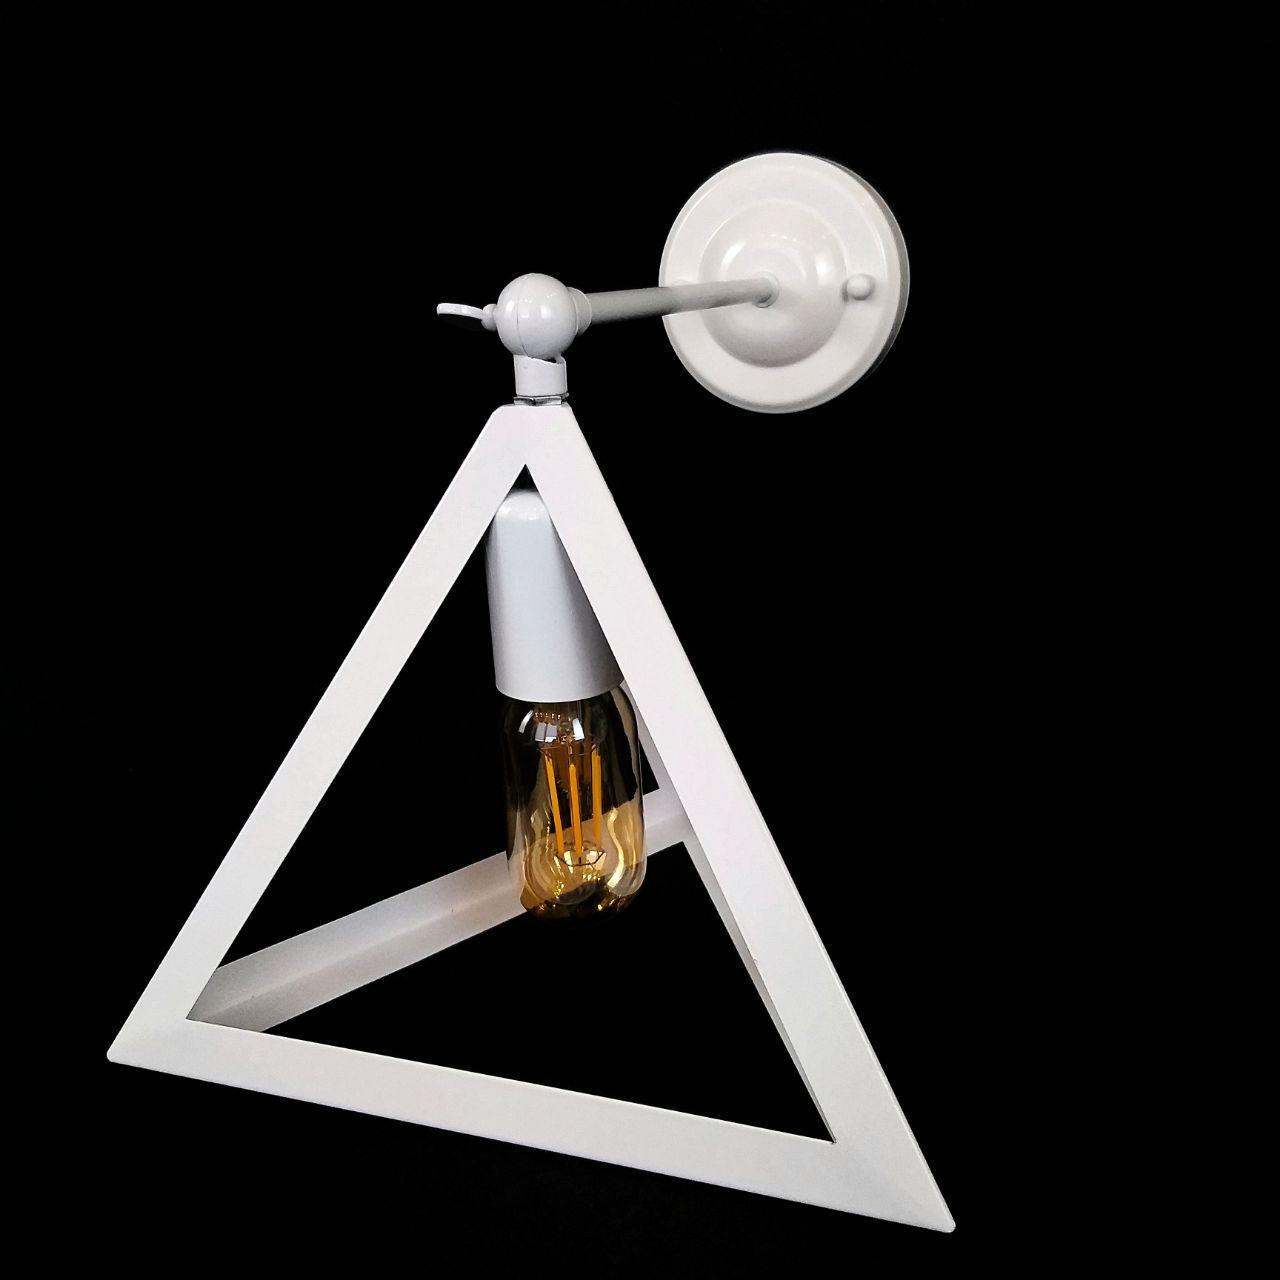 Бра на одну лампу в стиле лофт пирамида  белая поворотное YS-TY001-B/1W WH